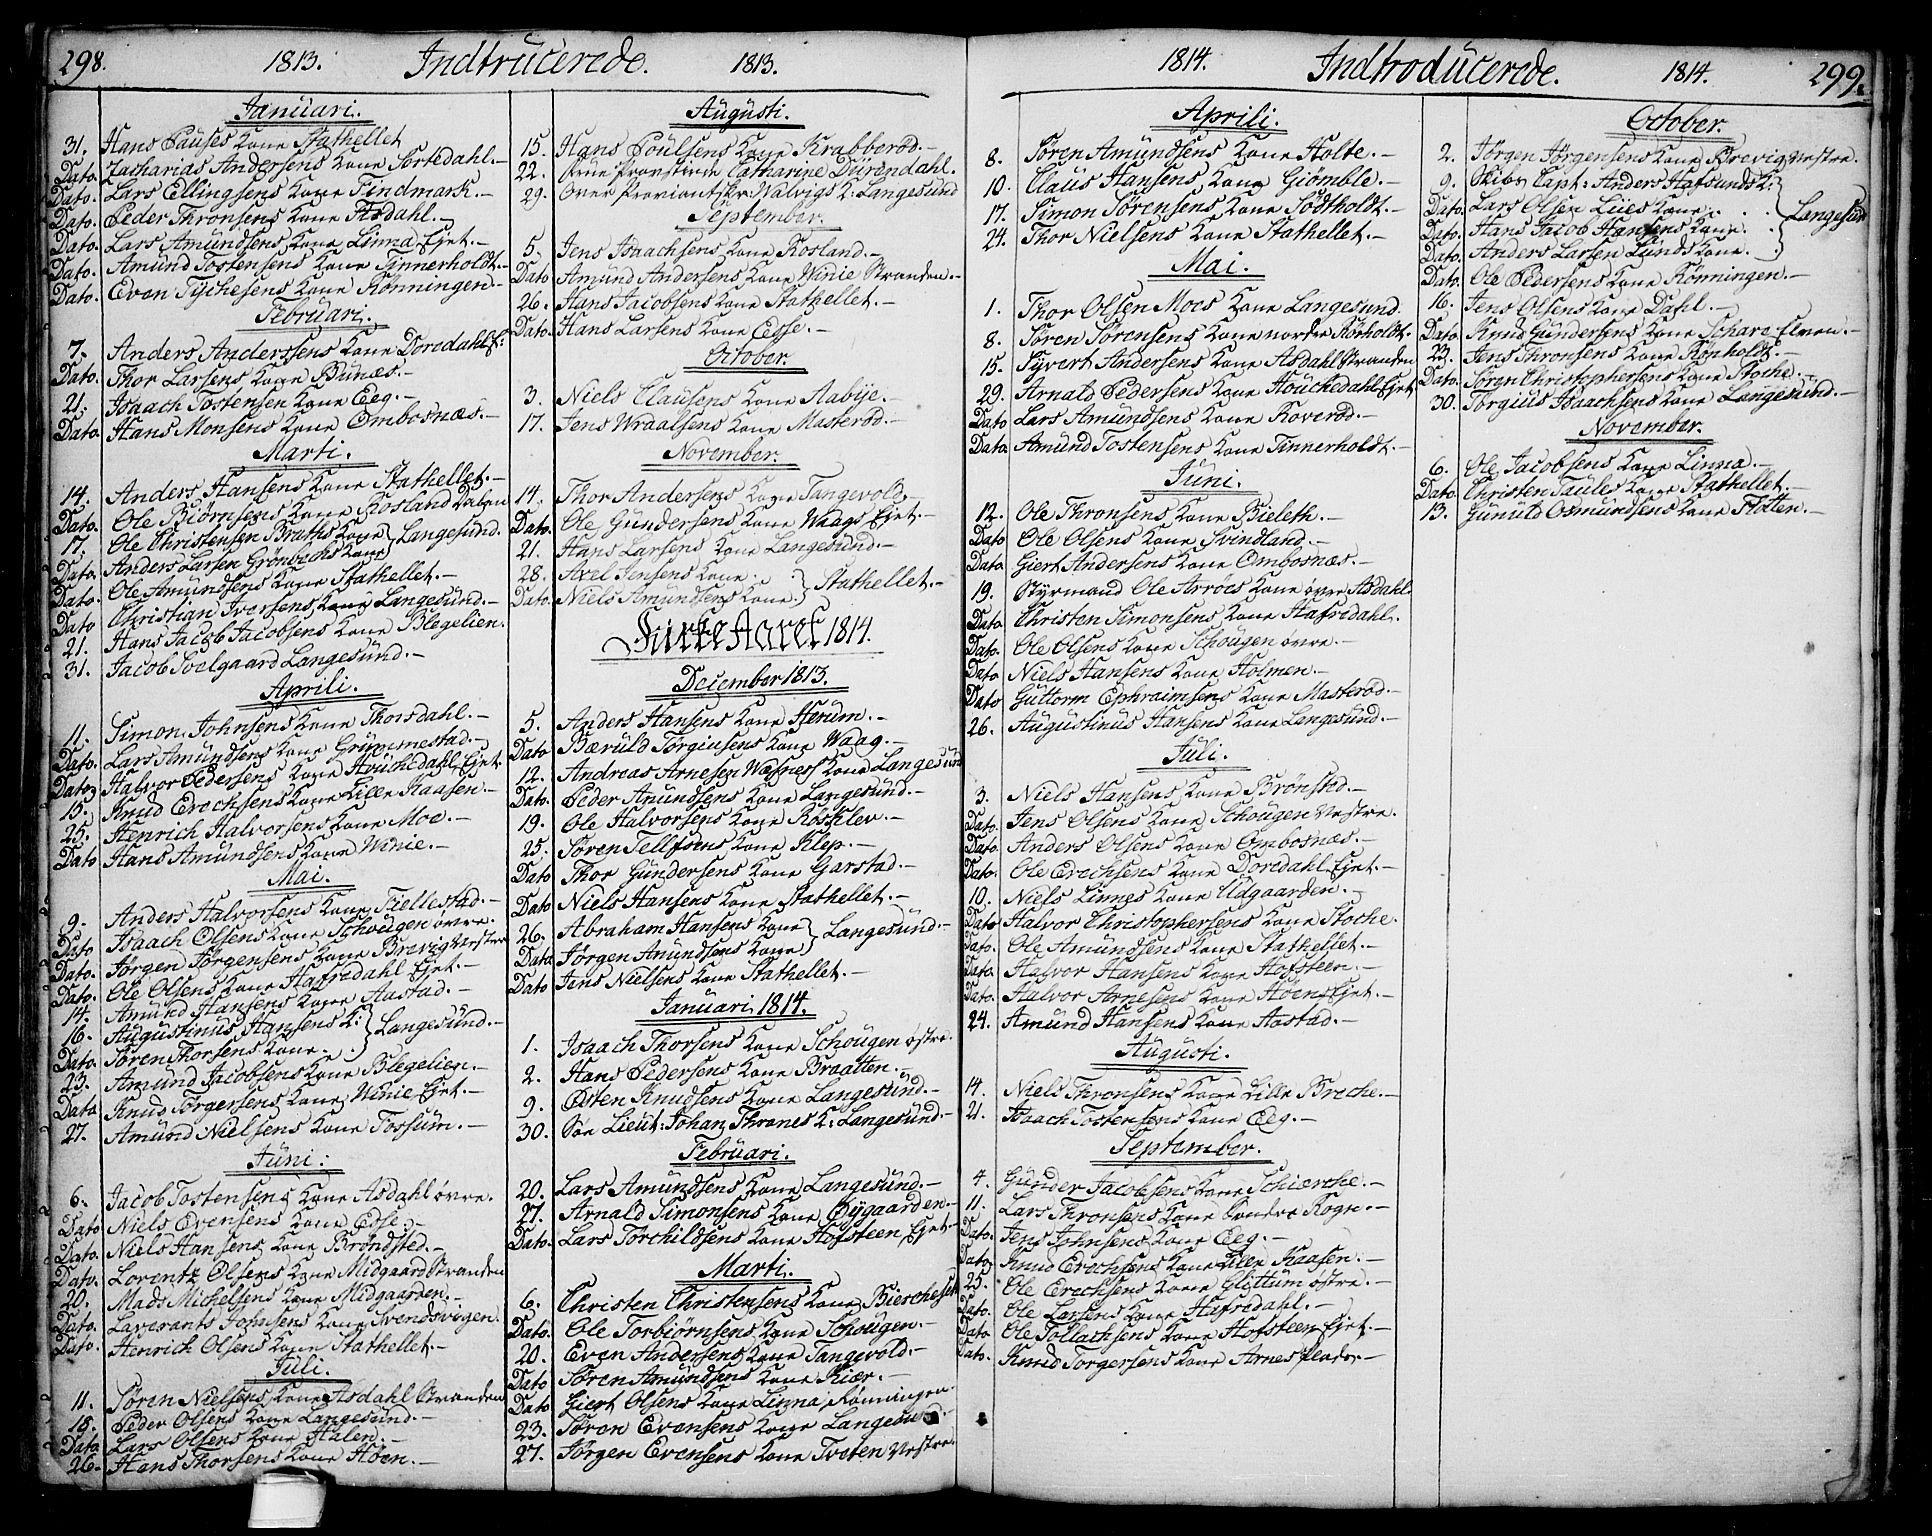 SAKO, Bamble kirkebøker, F/Fa/L0002: Ministerialbok nr. I 2, 1775-1814, s. 298-299